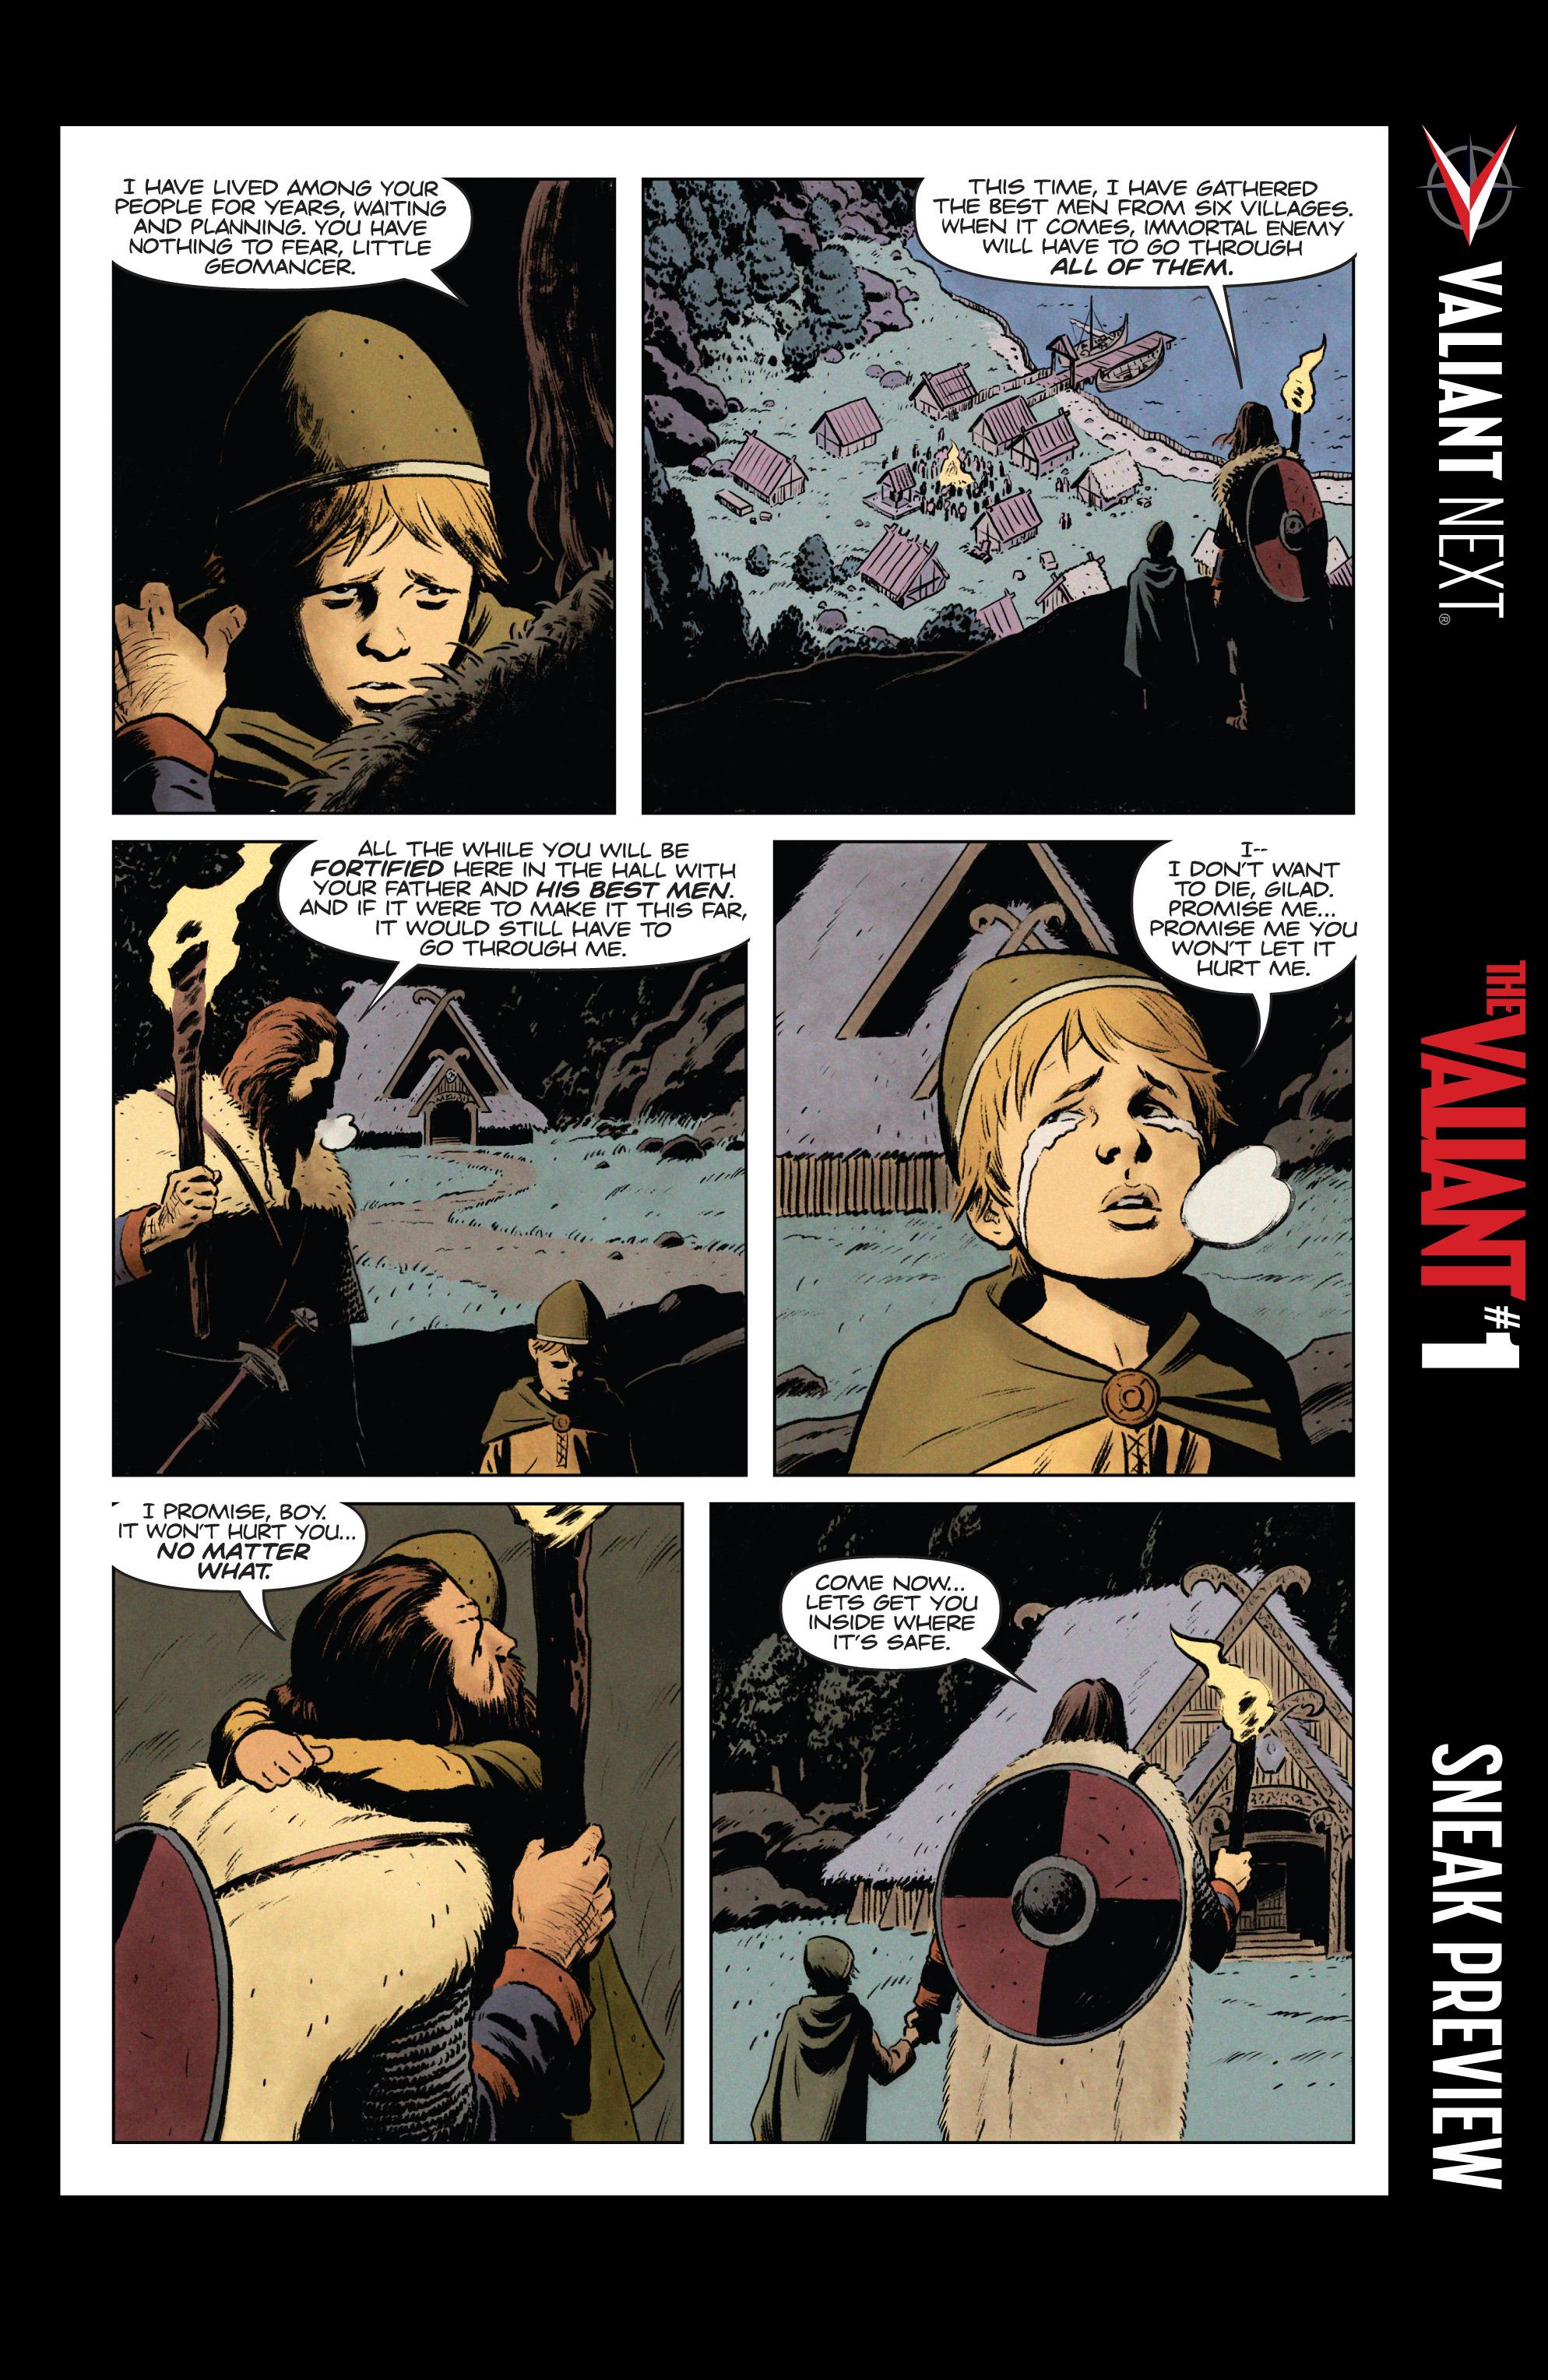 Read online Eternal Warrior: Days of Steel comic -  Issue #1 - 26